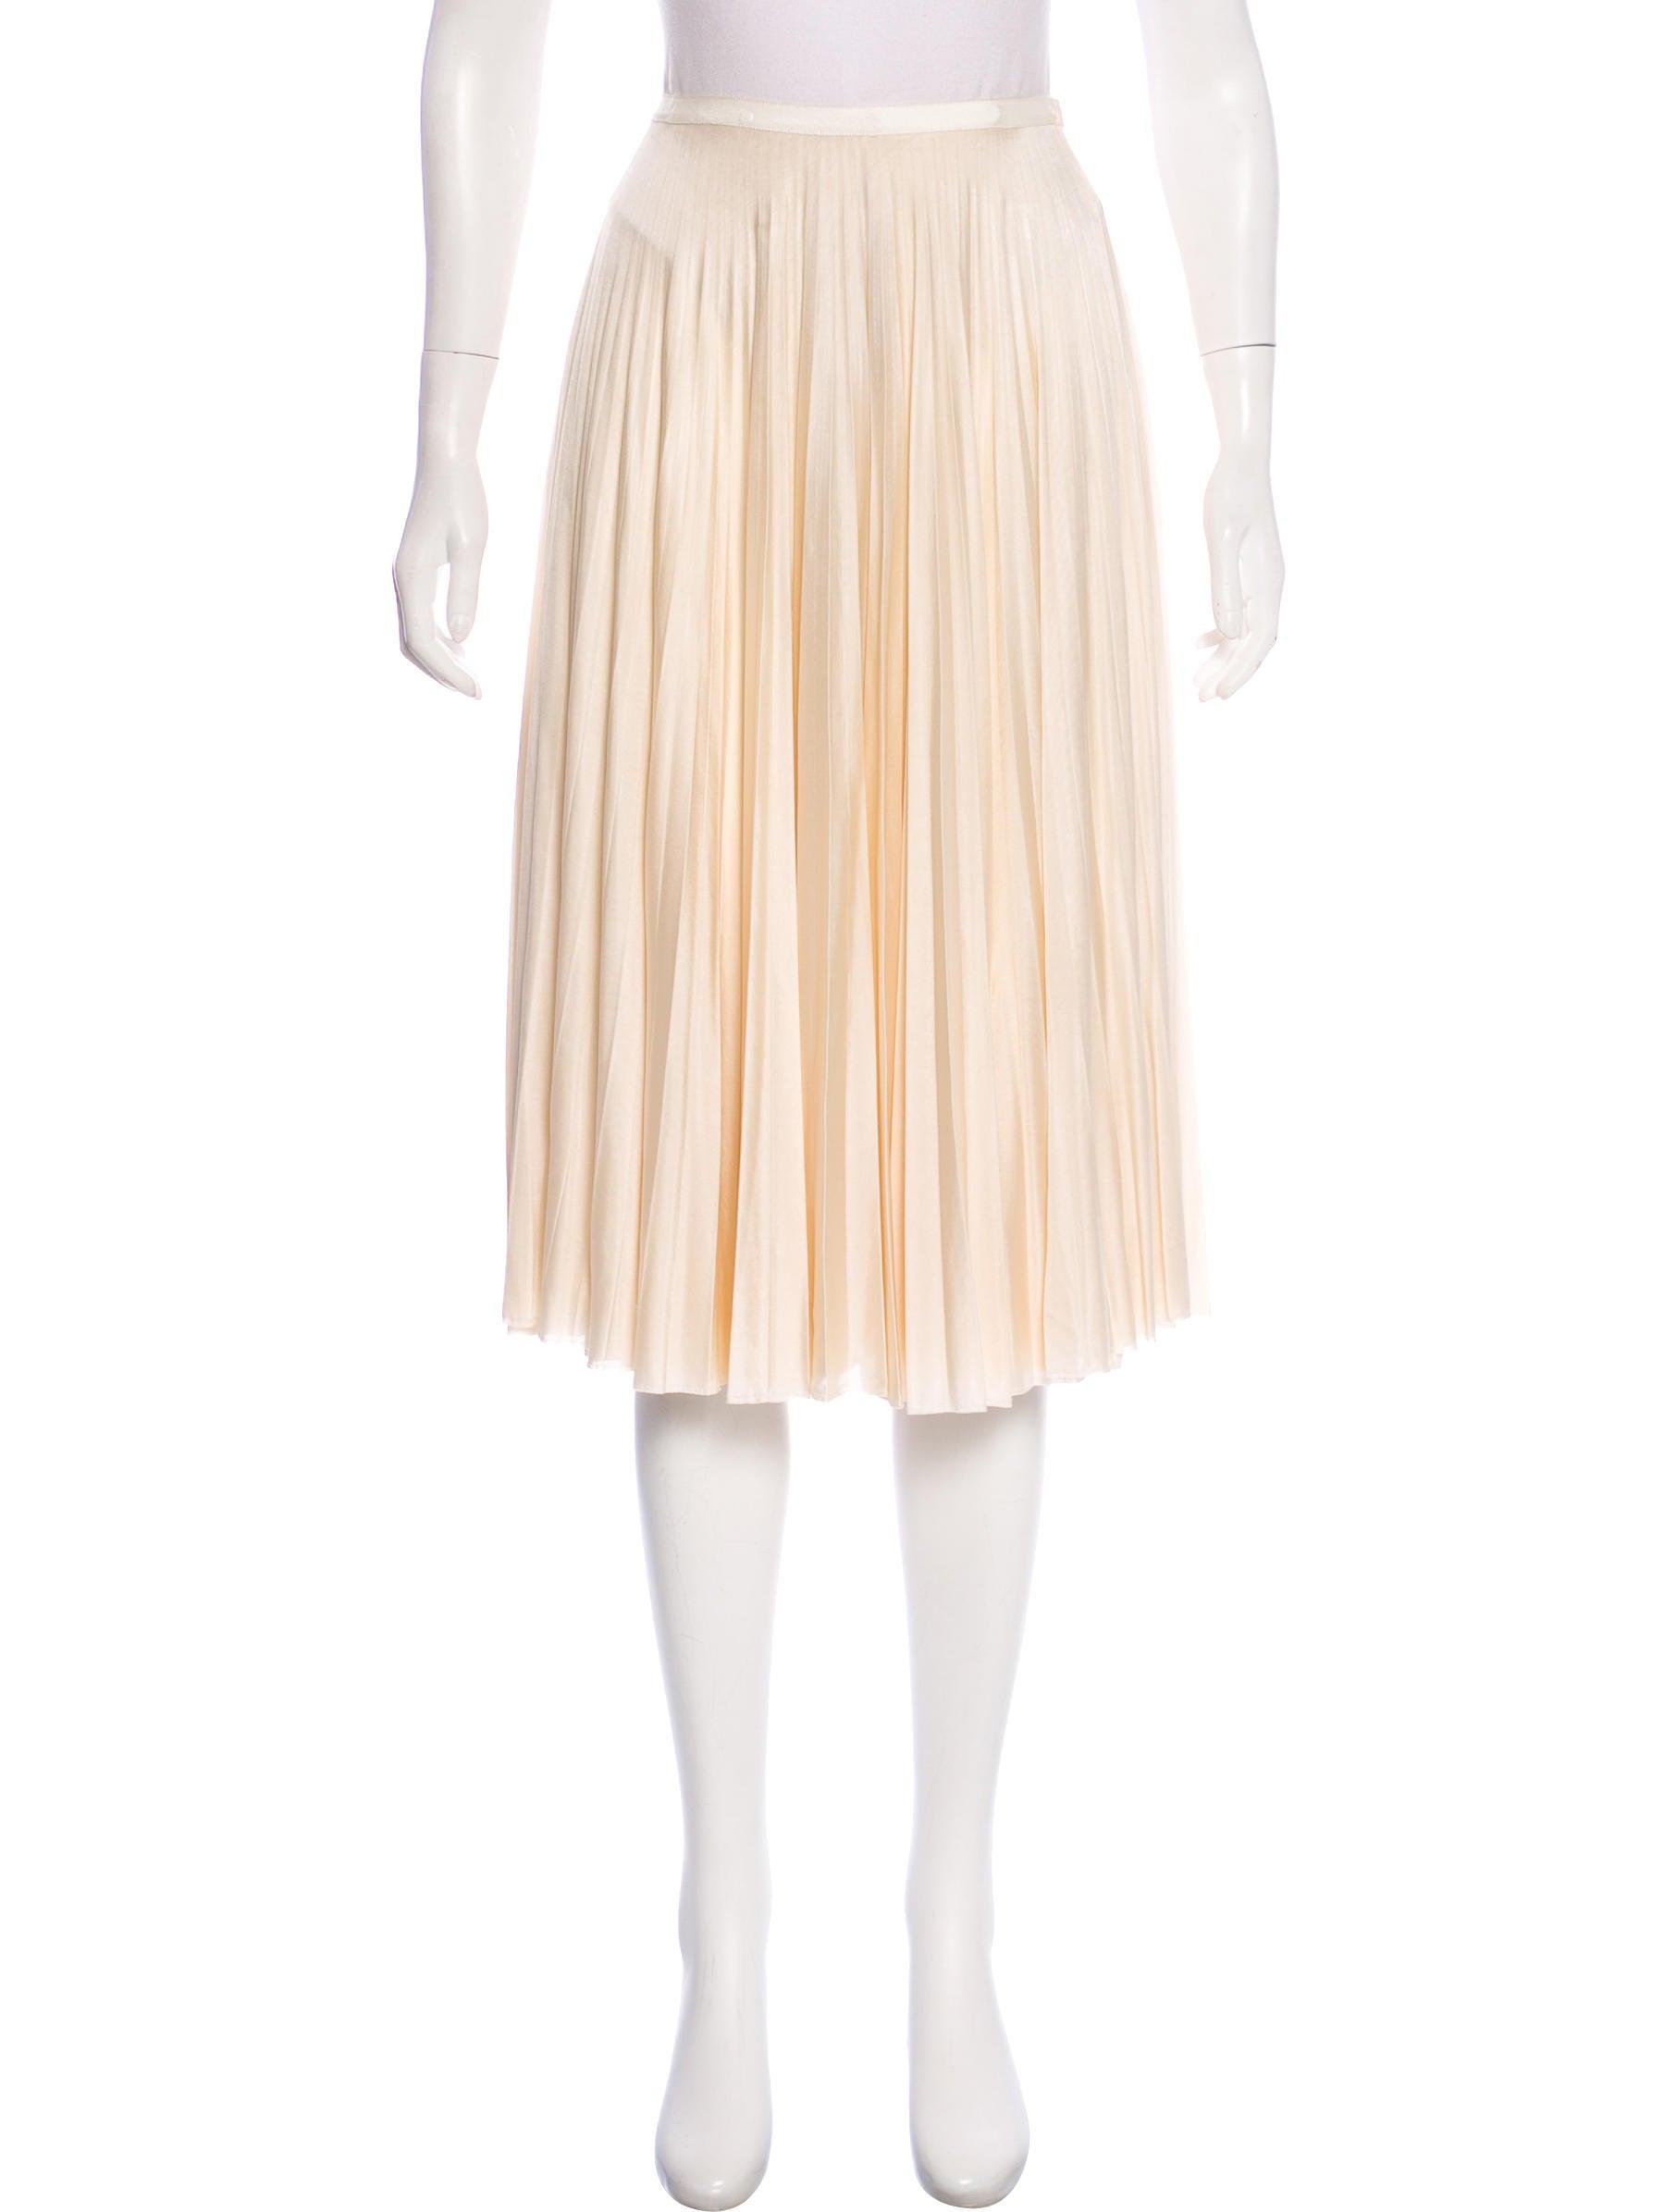 033fb058a5 TSE Cashmere Pleated Midi Skirt - Clothing - TSCHG21062 | The RealReal